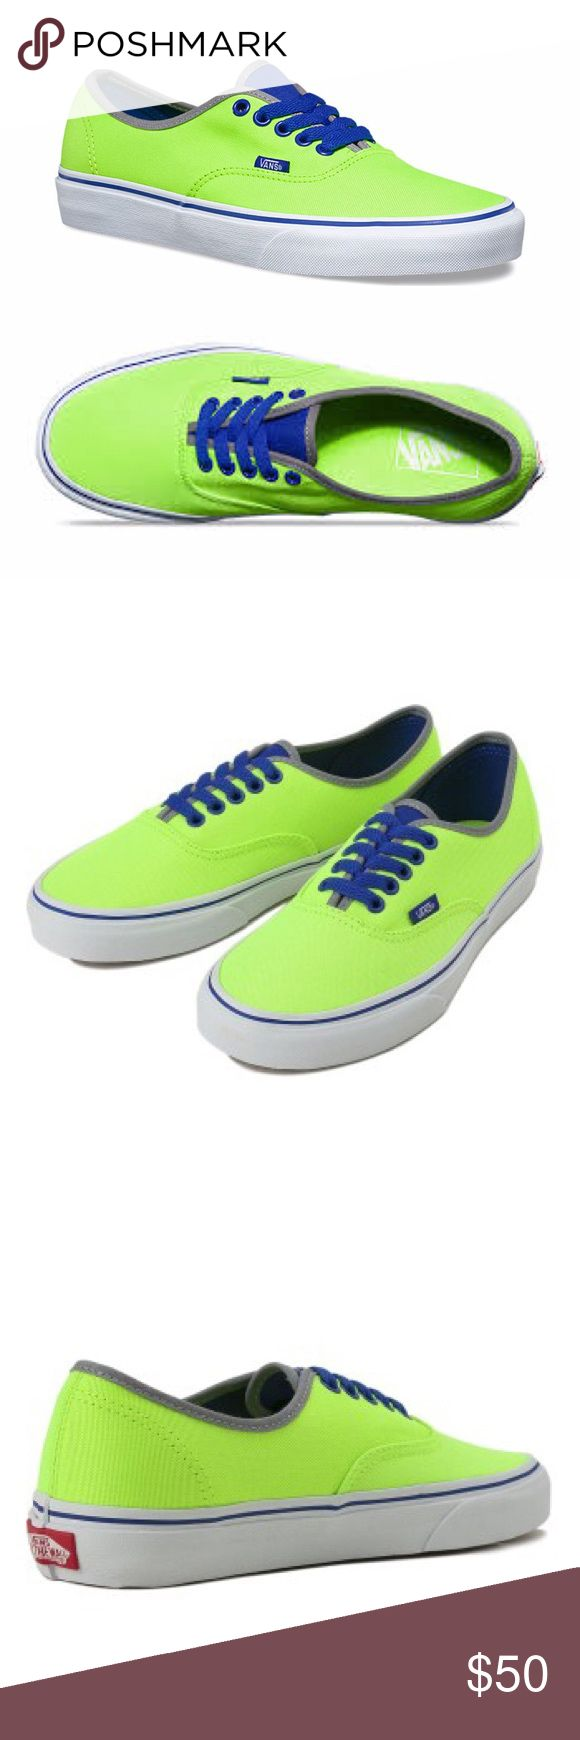 Highlighter Green Neon Vans 100% vegan canvas vans in bright neon green. Blue laces. Amazing contrast! Brand new in box! Vans Shoes Sneakers